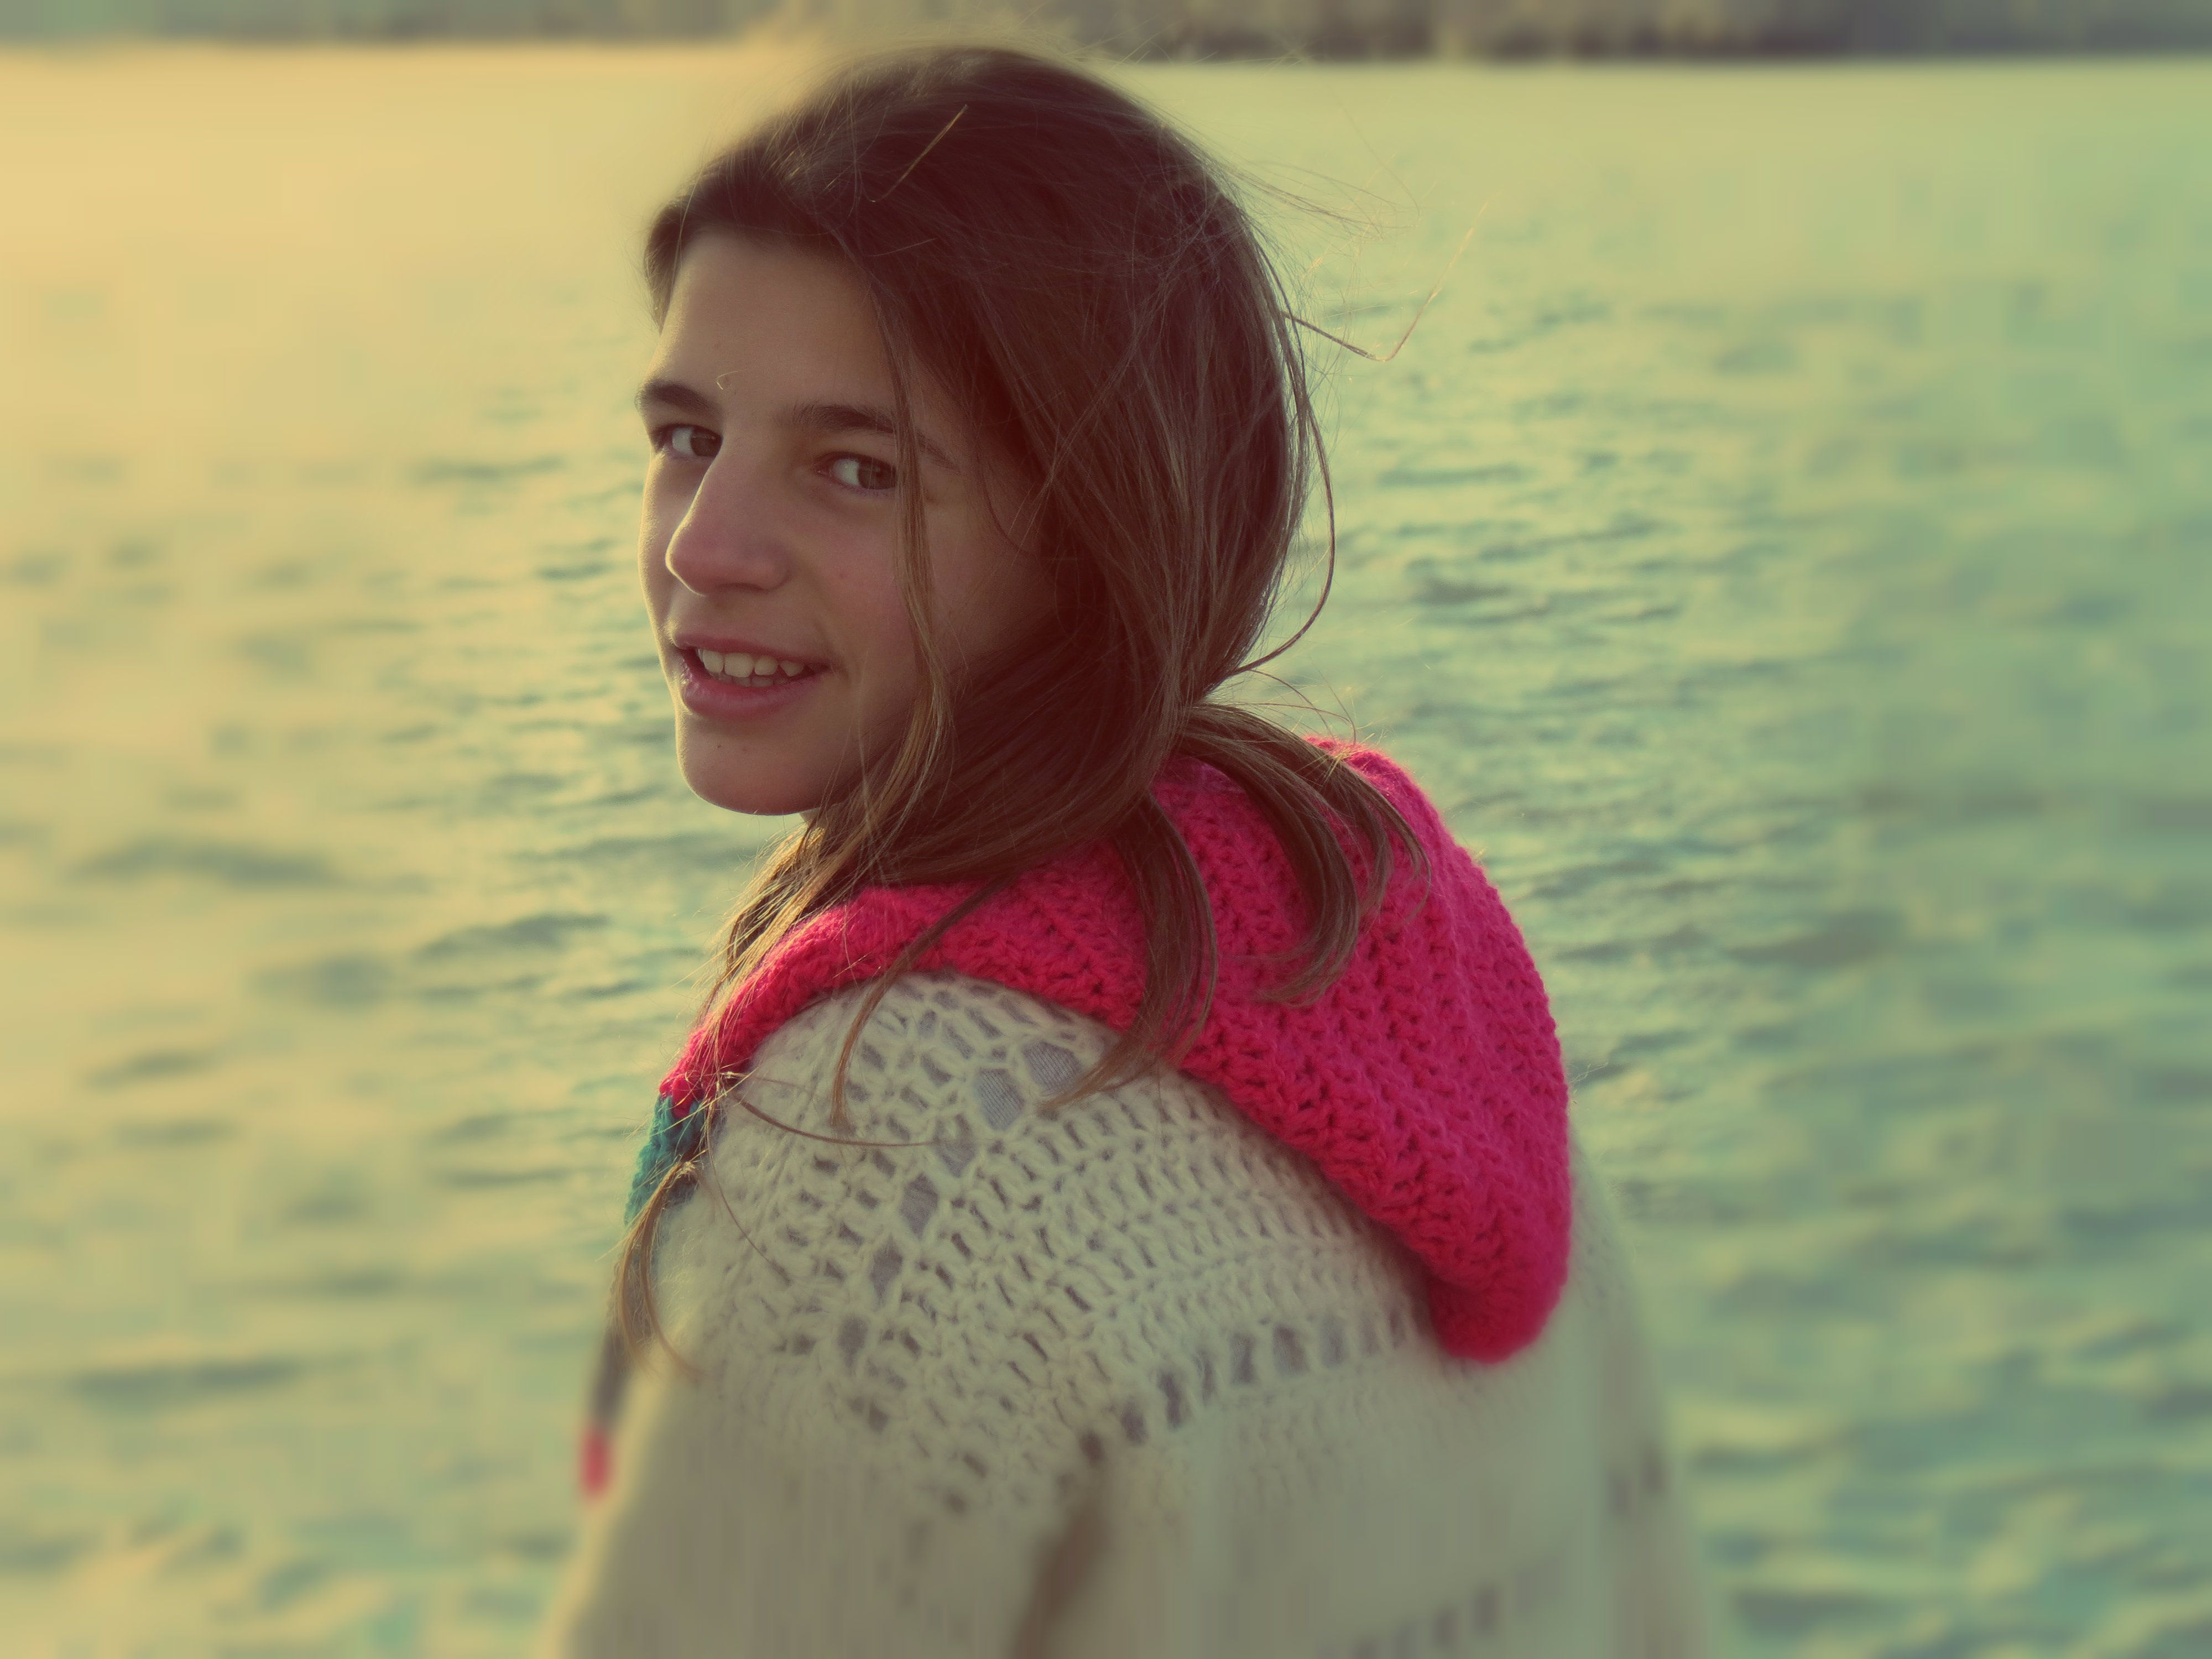 capucha&bufanda #knit #mariadelapaz